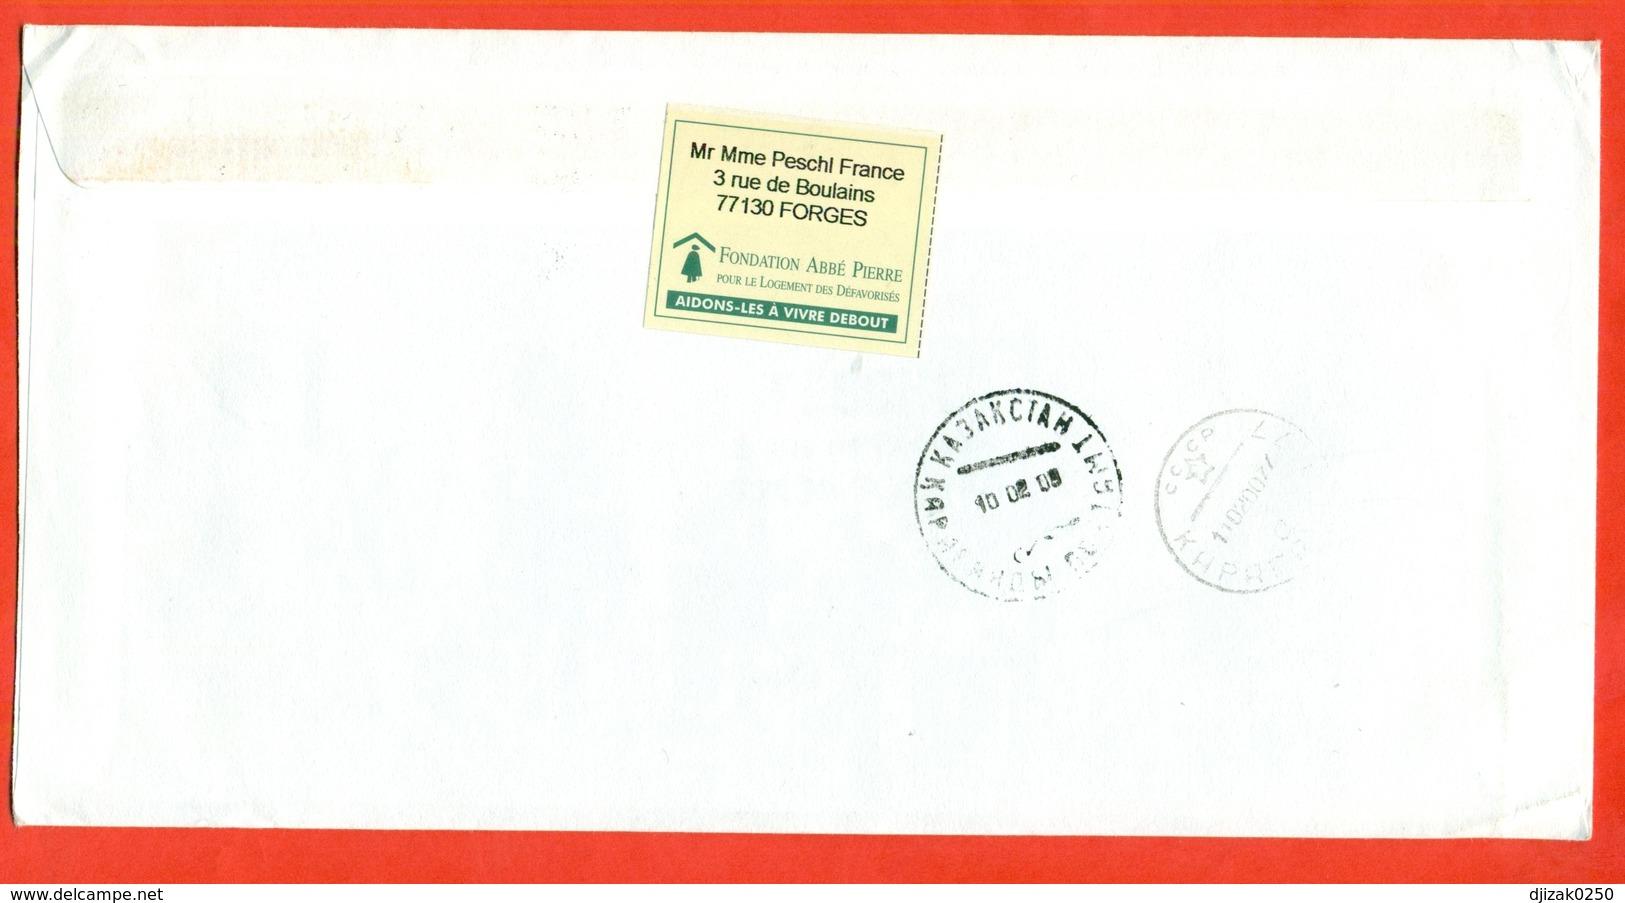 France 2000. Lighthouse. Millennium. The Envelope Passed Mail. - France